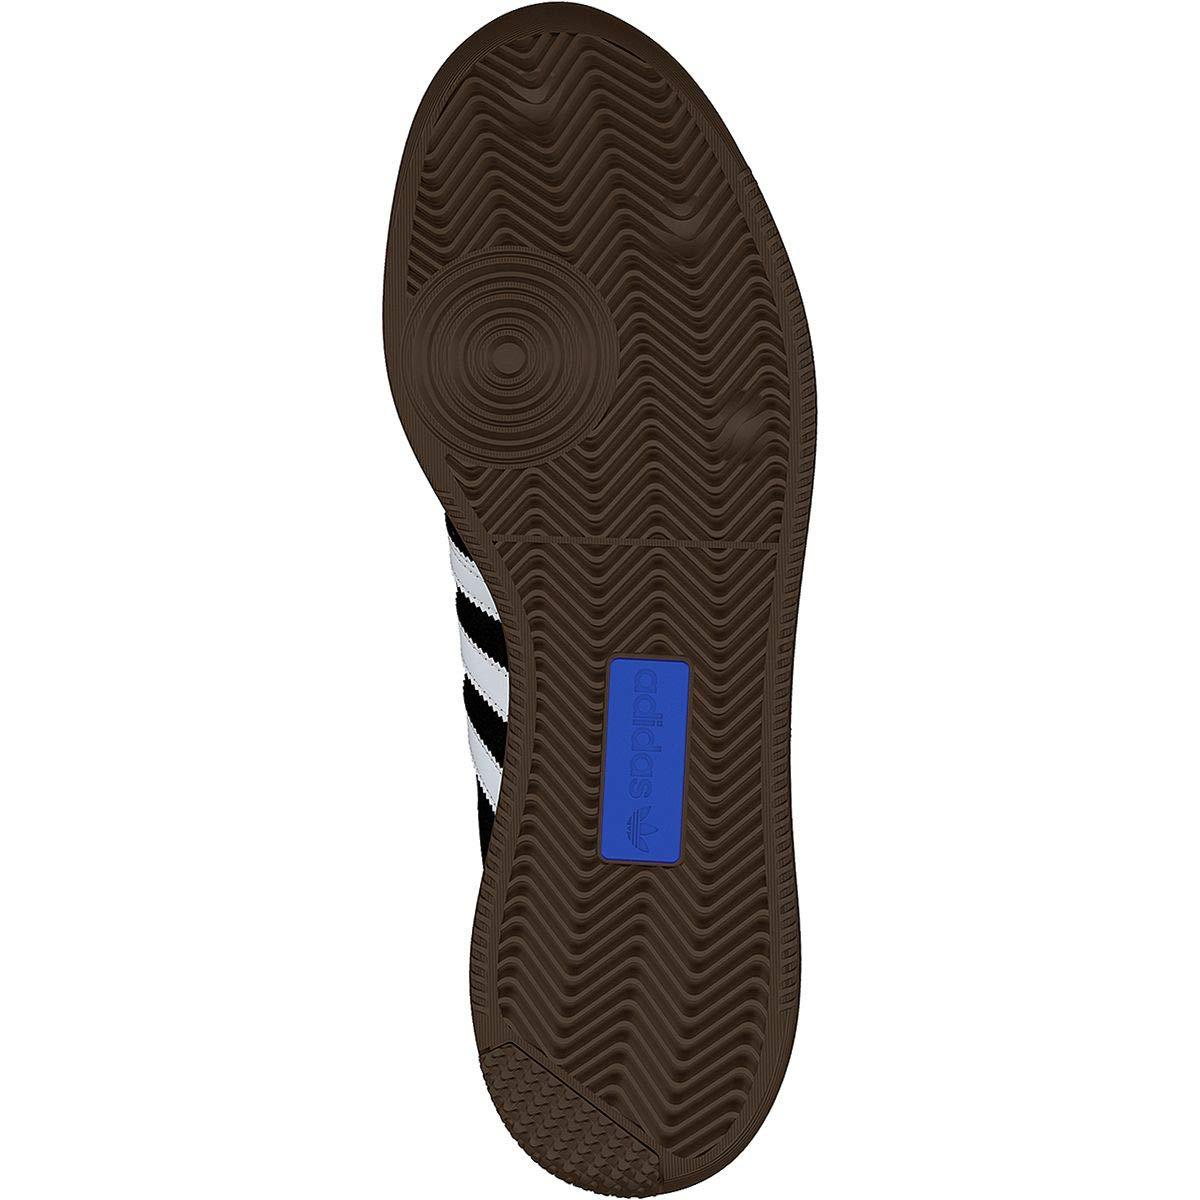 outlet store 0f0b6 dd35f Amazon.com  adidas Skateboarding Mens Samba ADV  Skateboardi